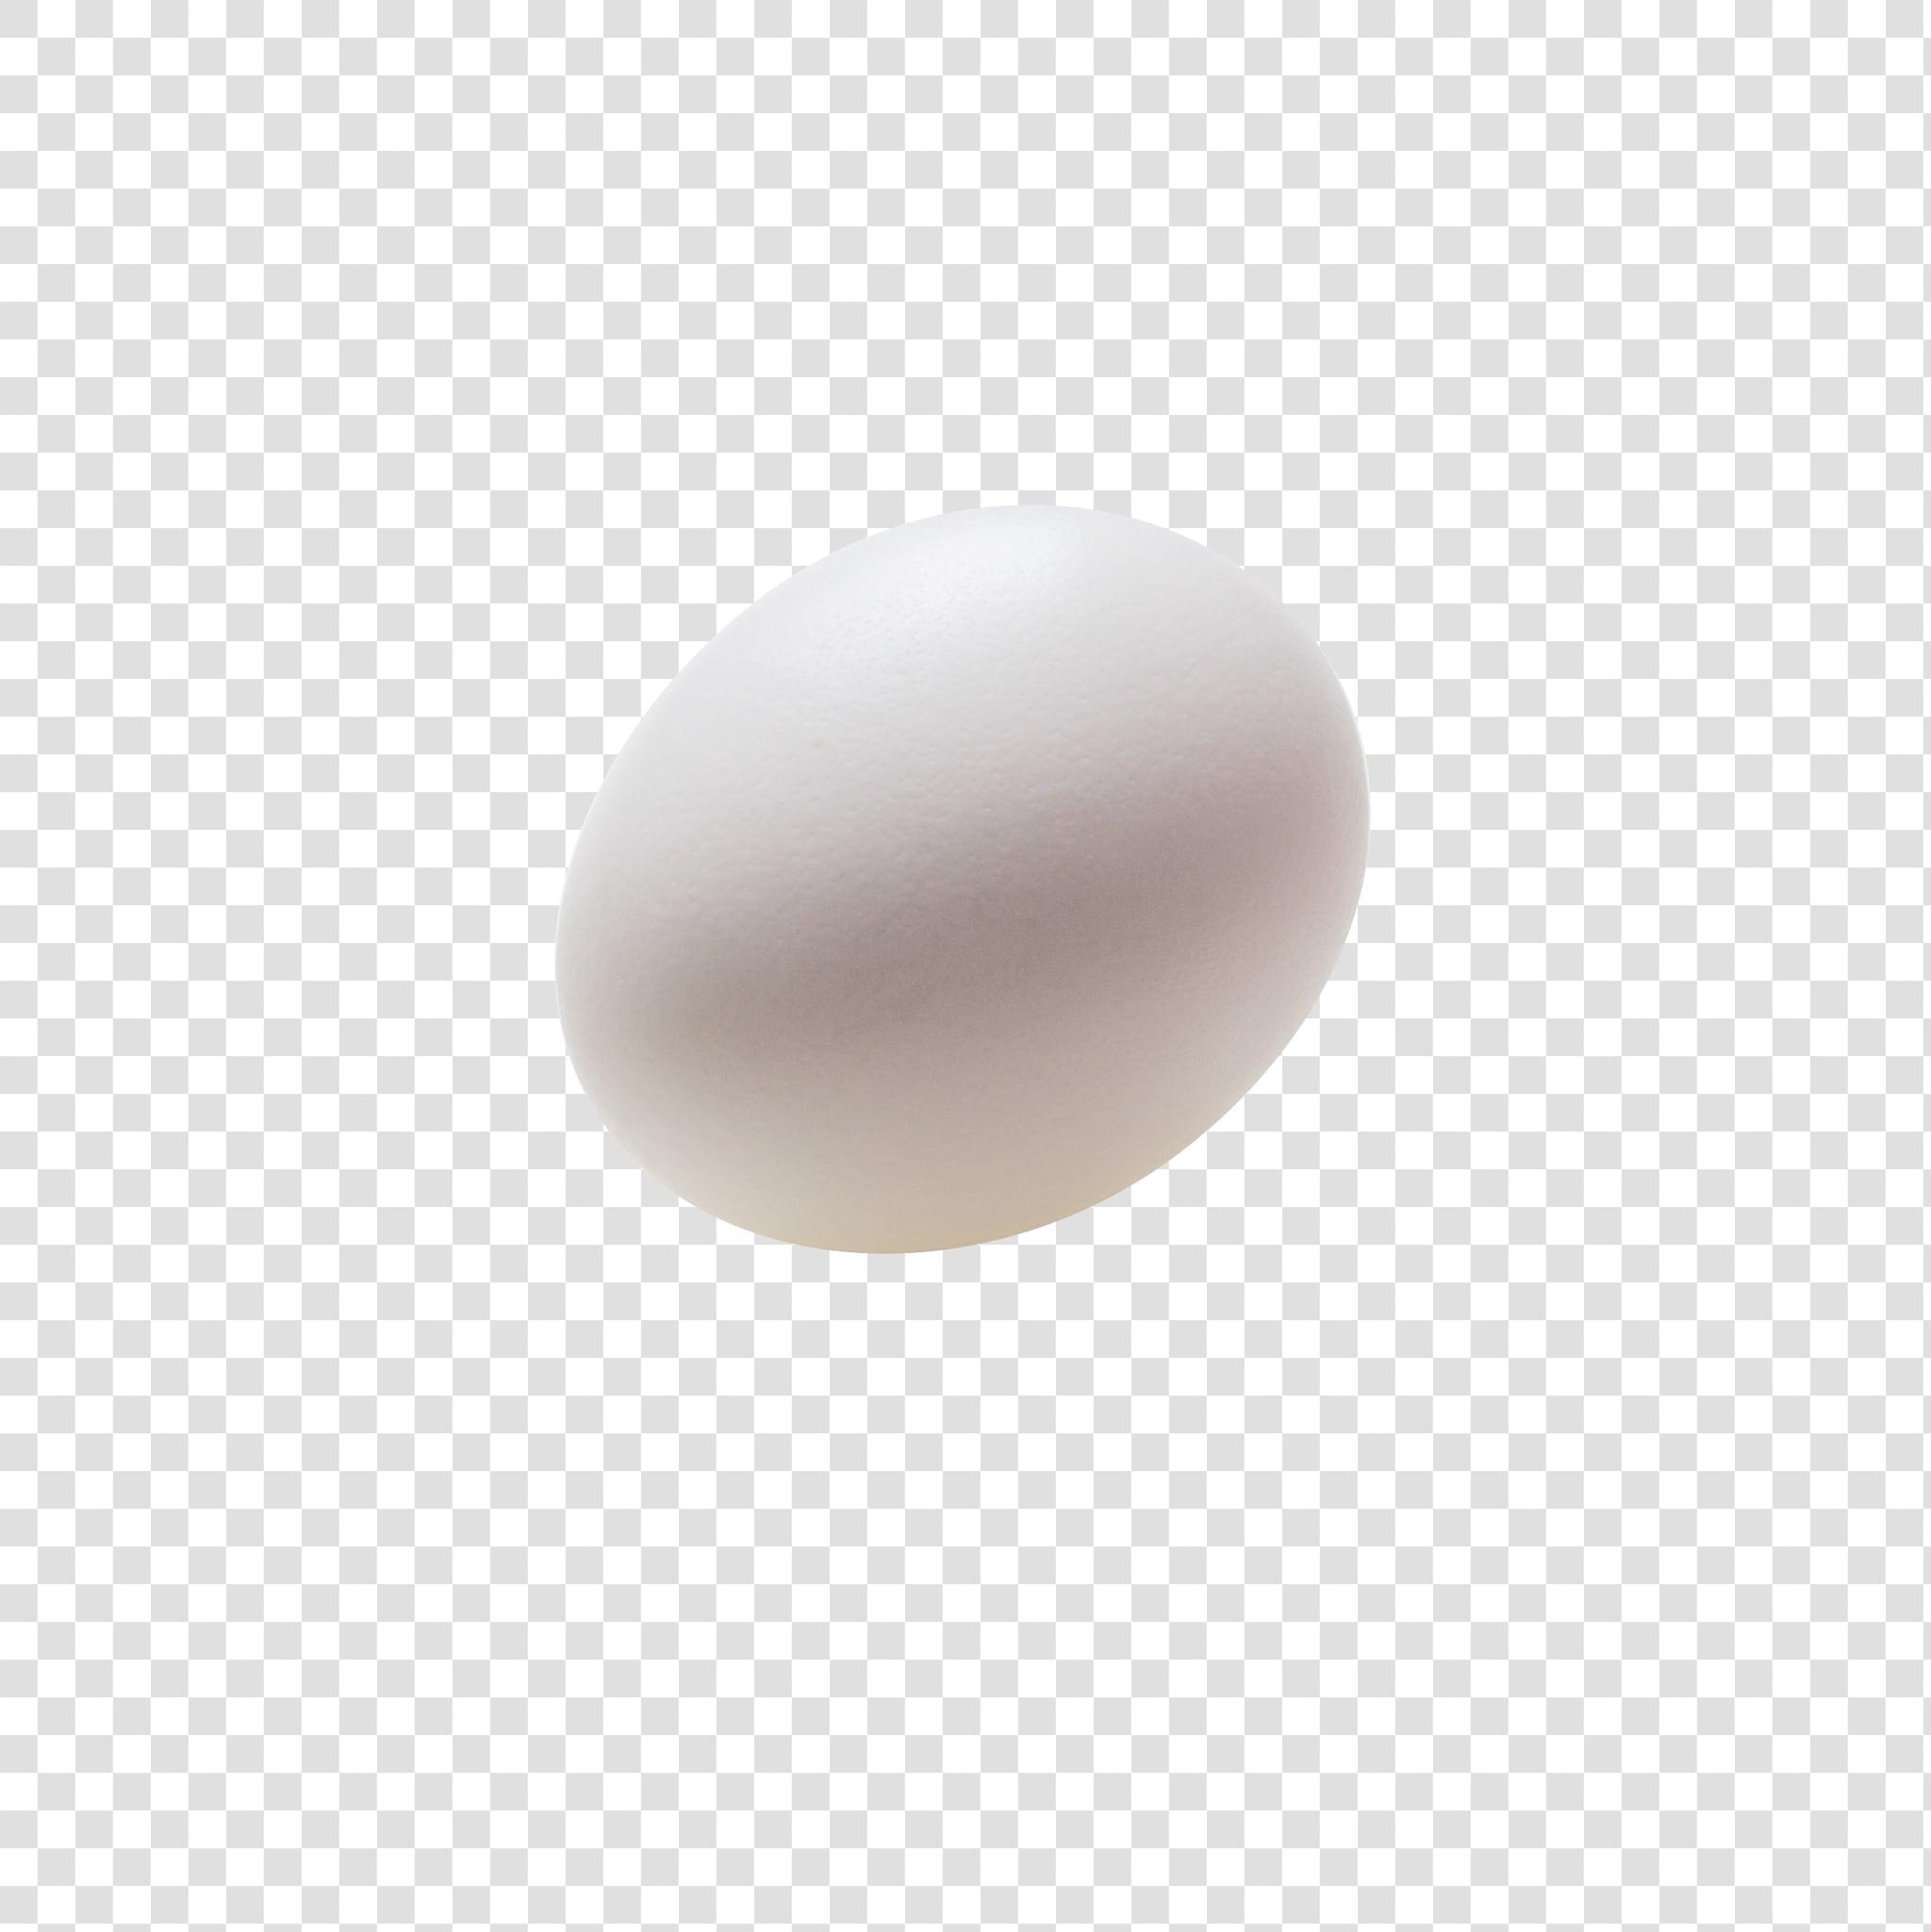 Egg PSD layered image